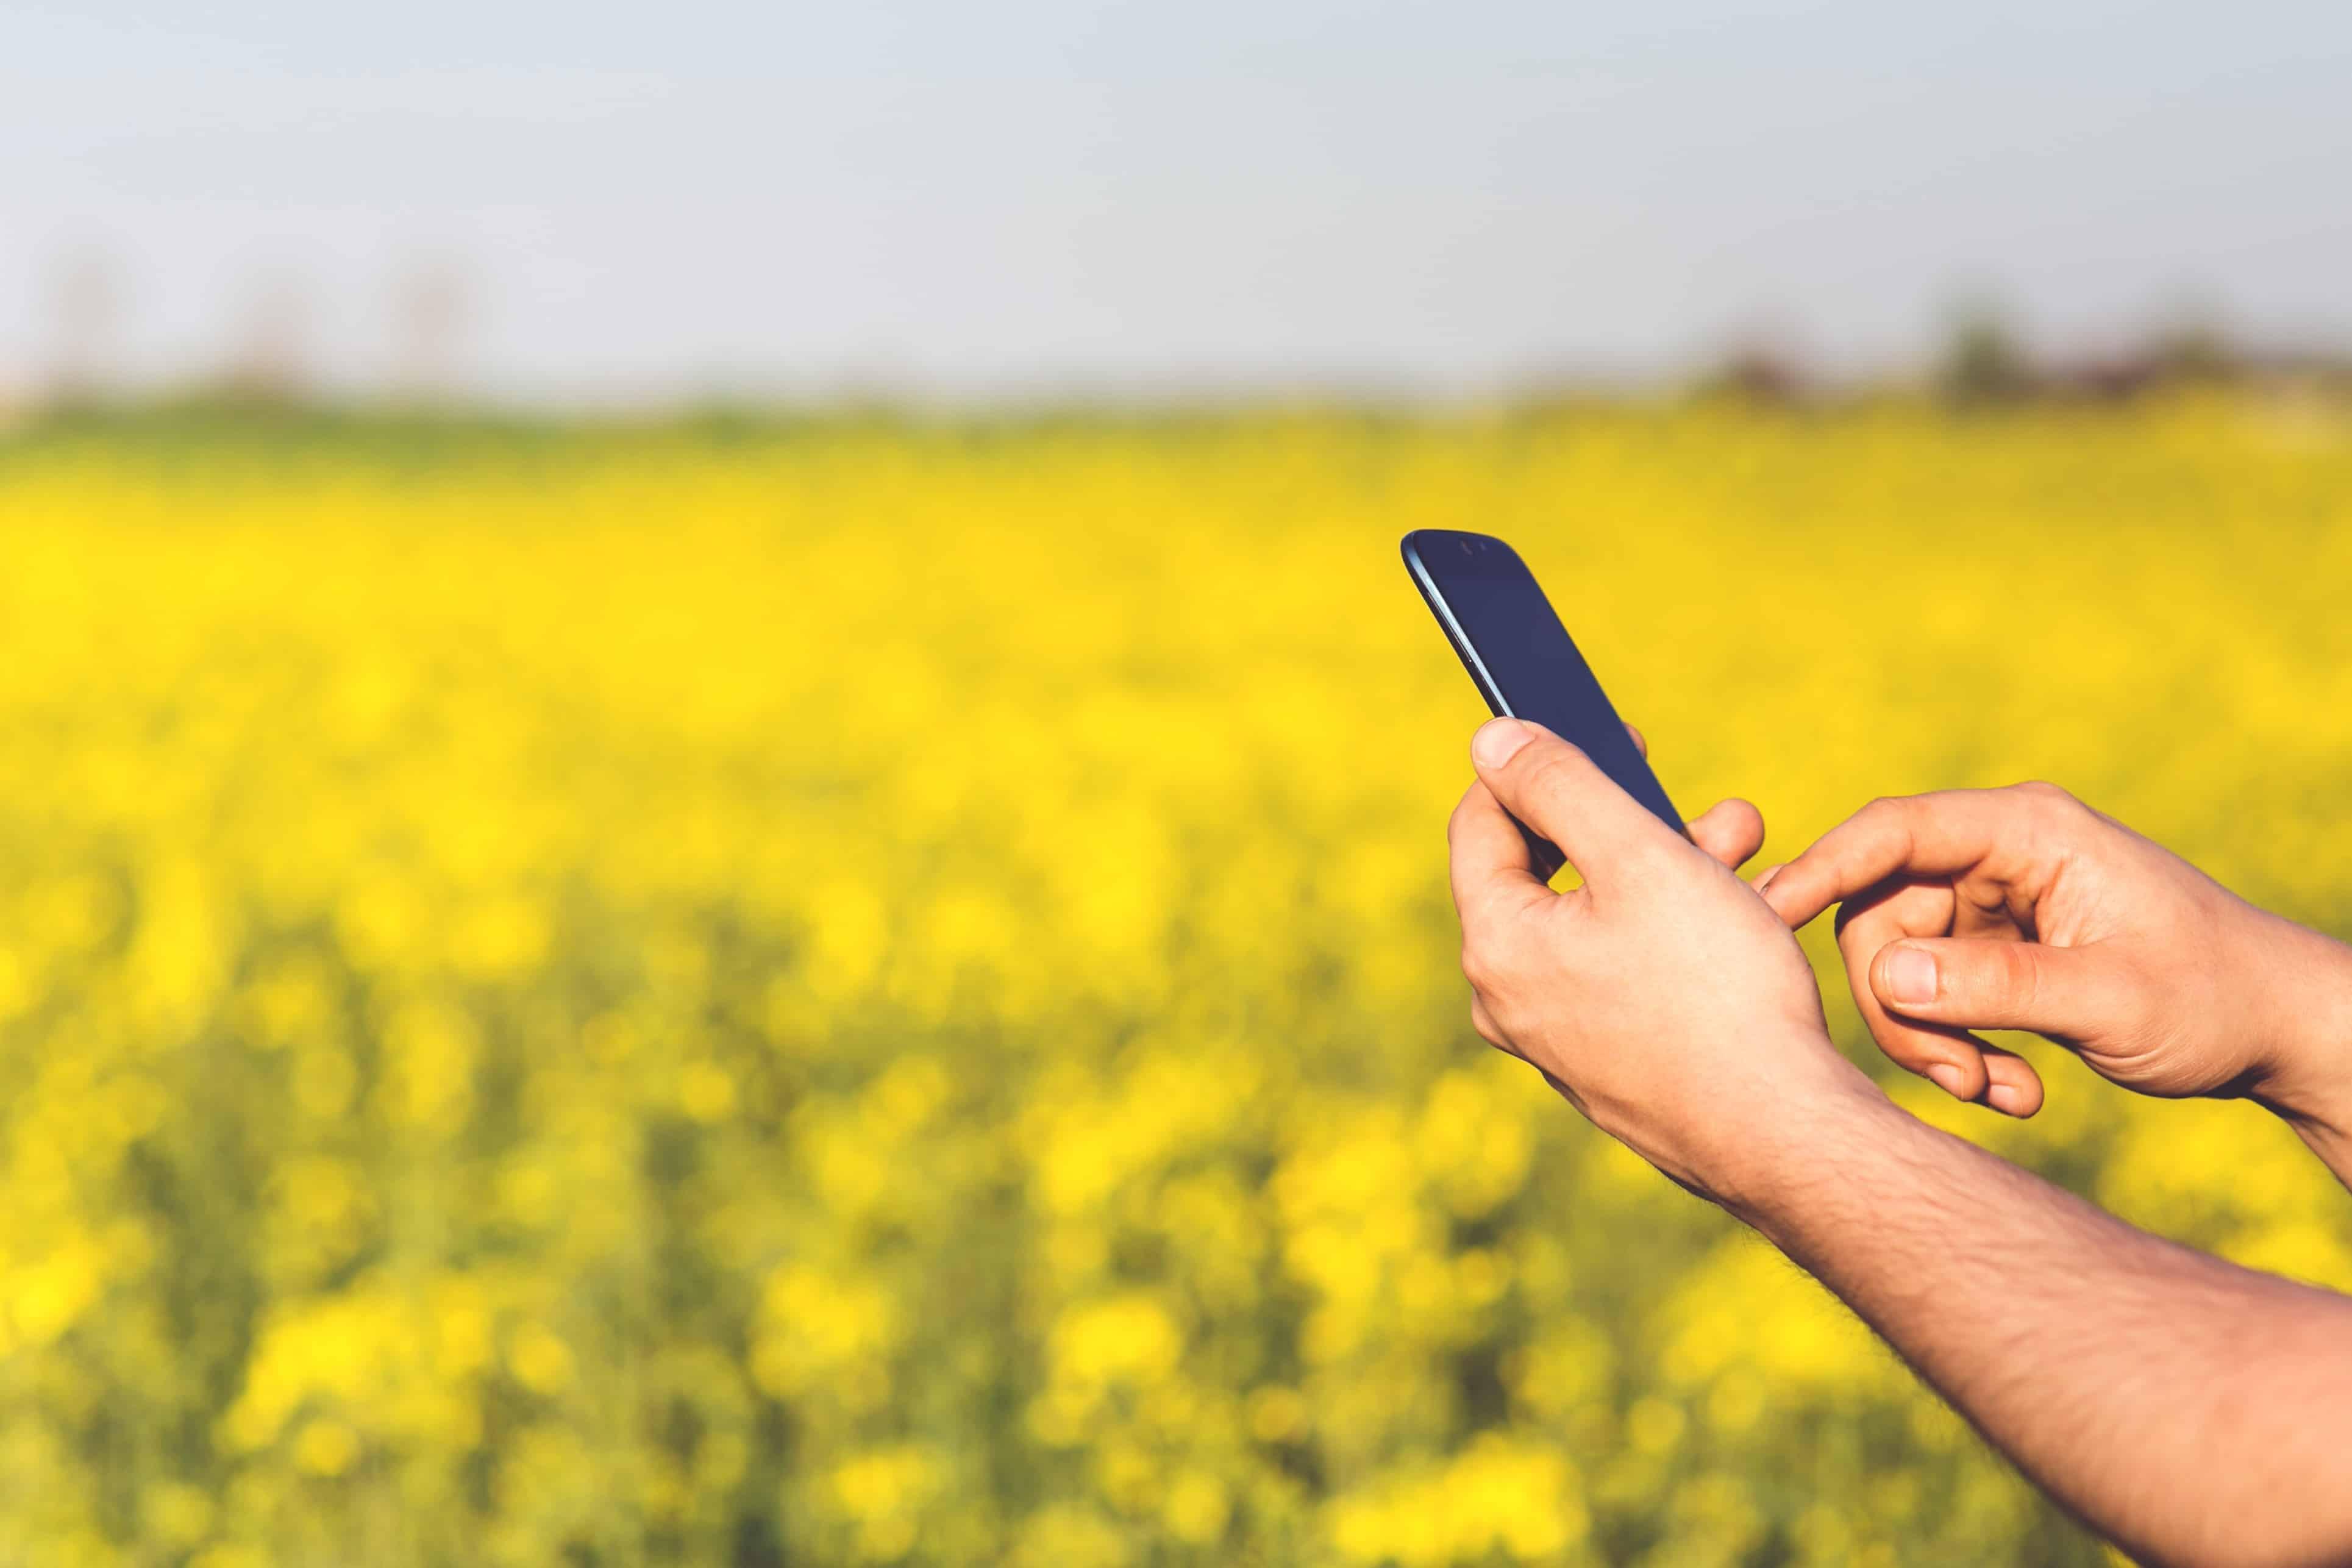 Agricultor com celular (Foto: Pxhere/Creative Commons)